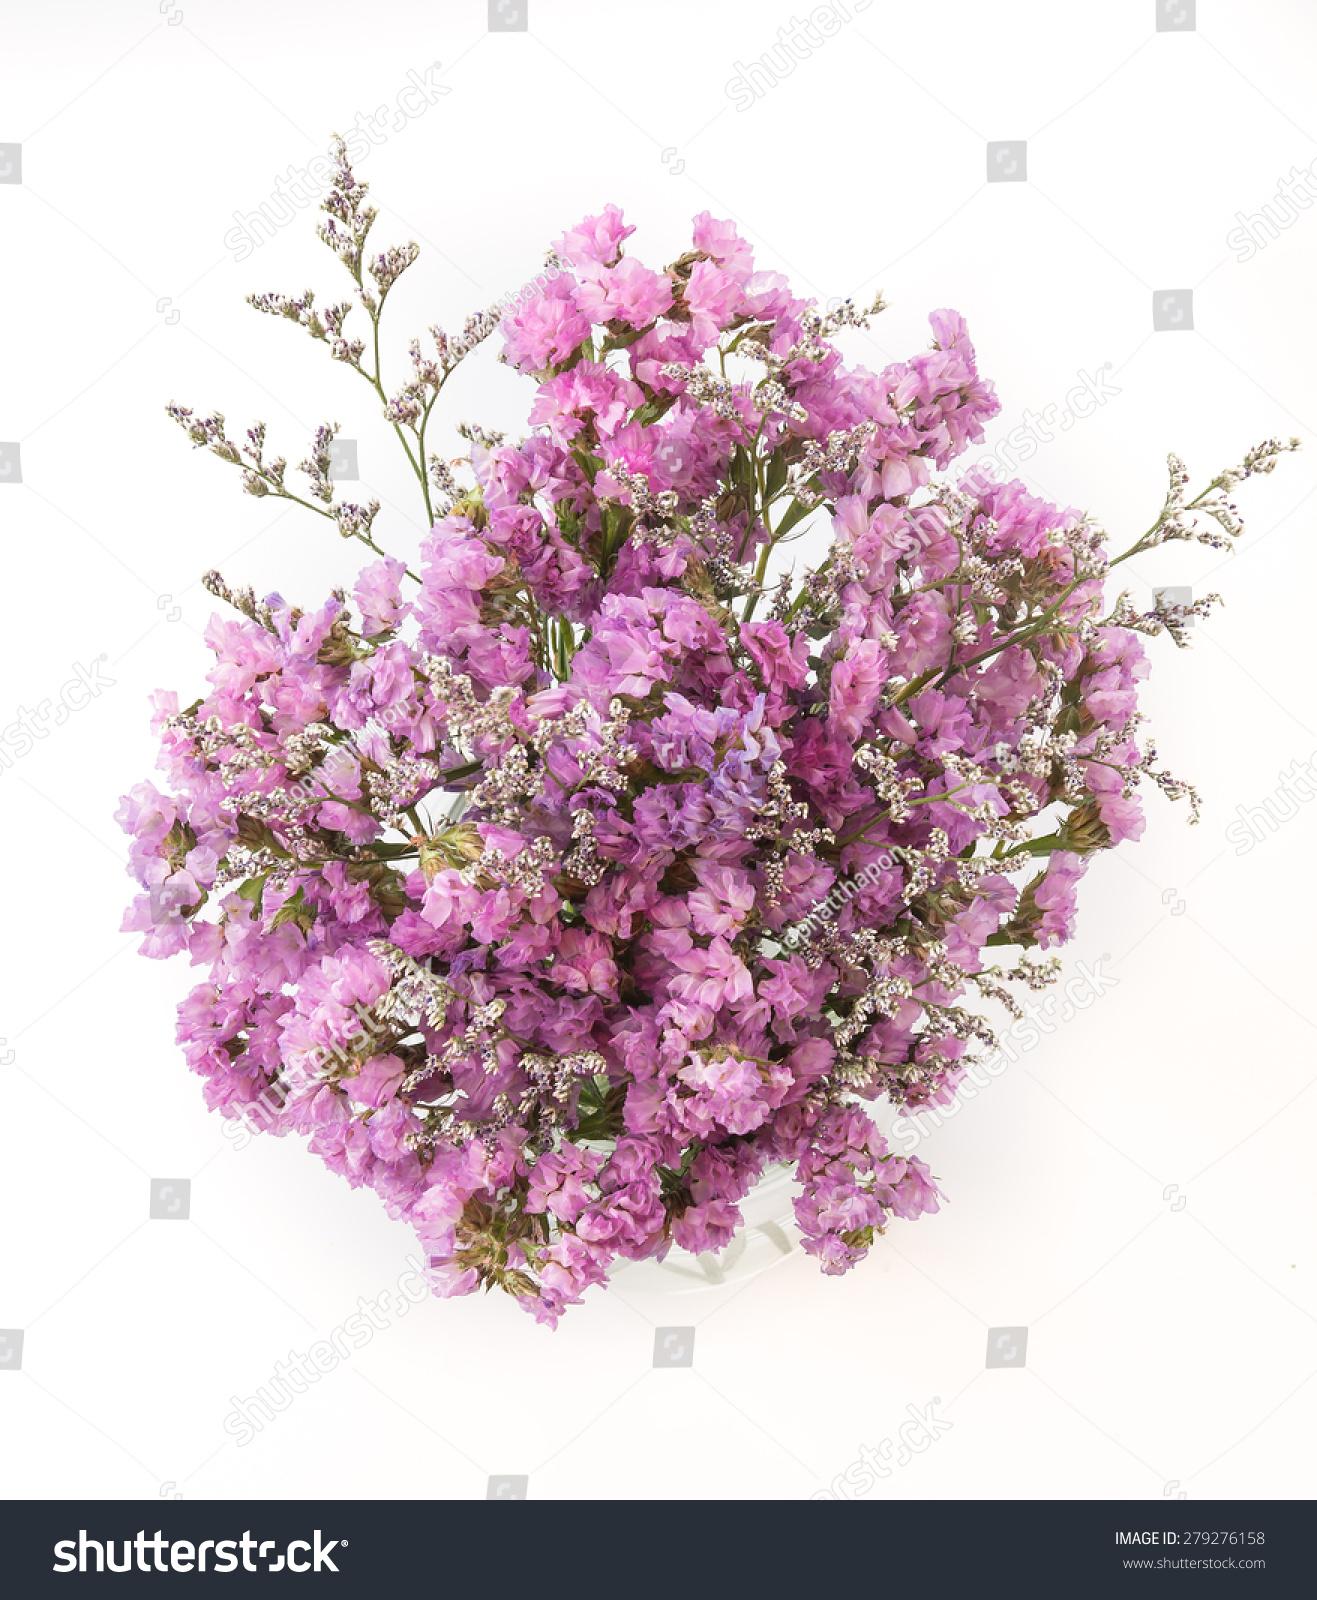 Statice flower bouquet on white background ez canvas id 279276158 mightylinksfo